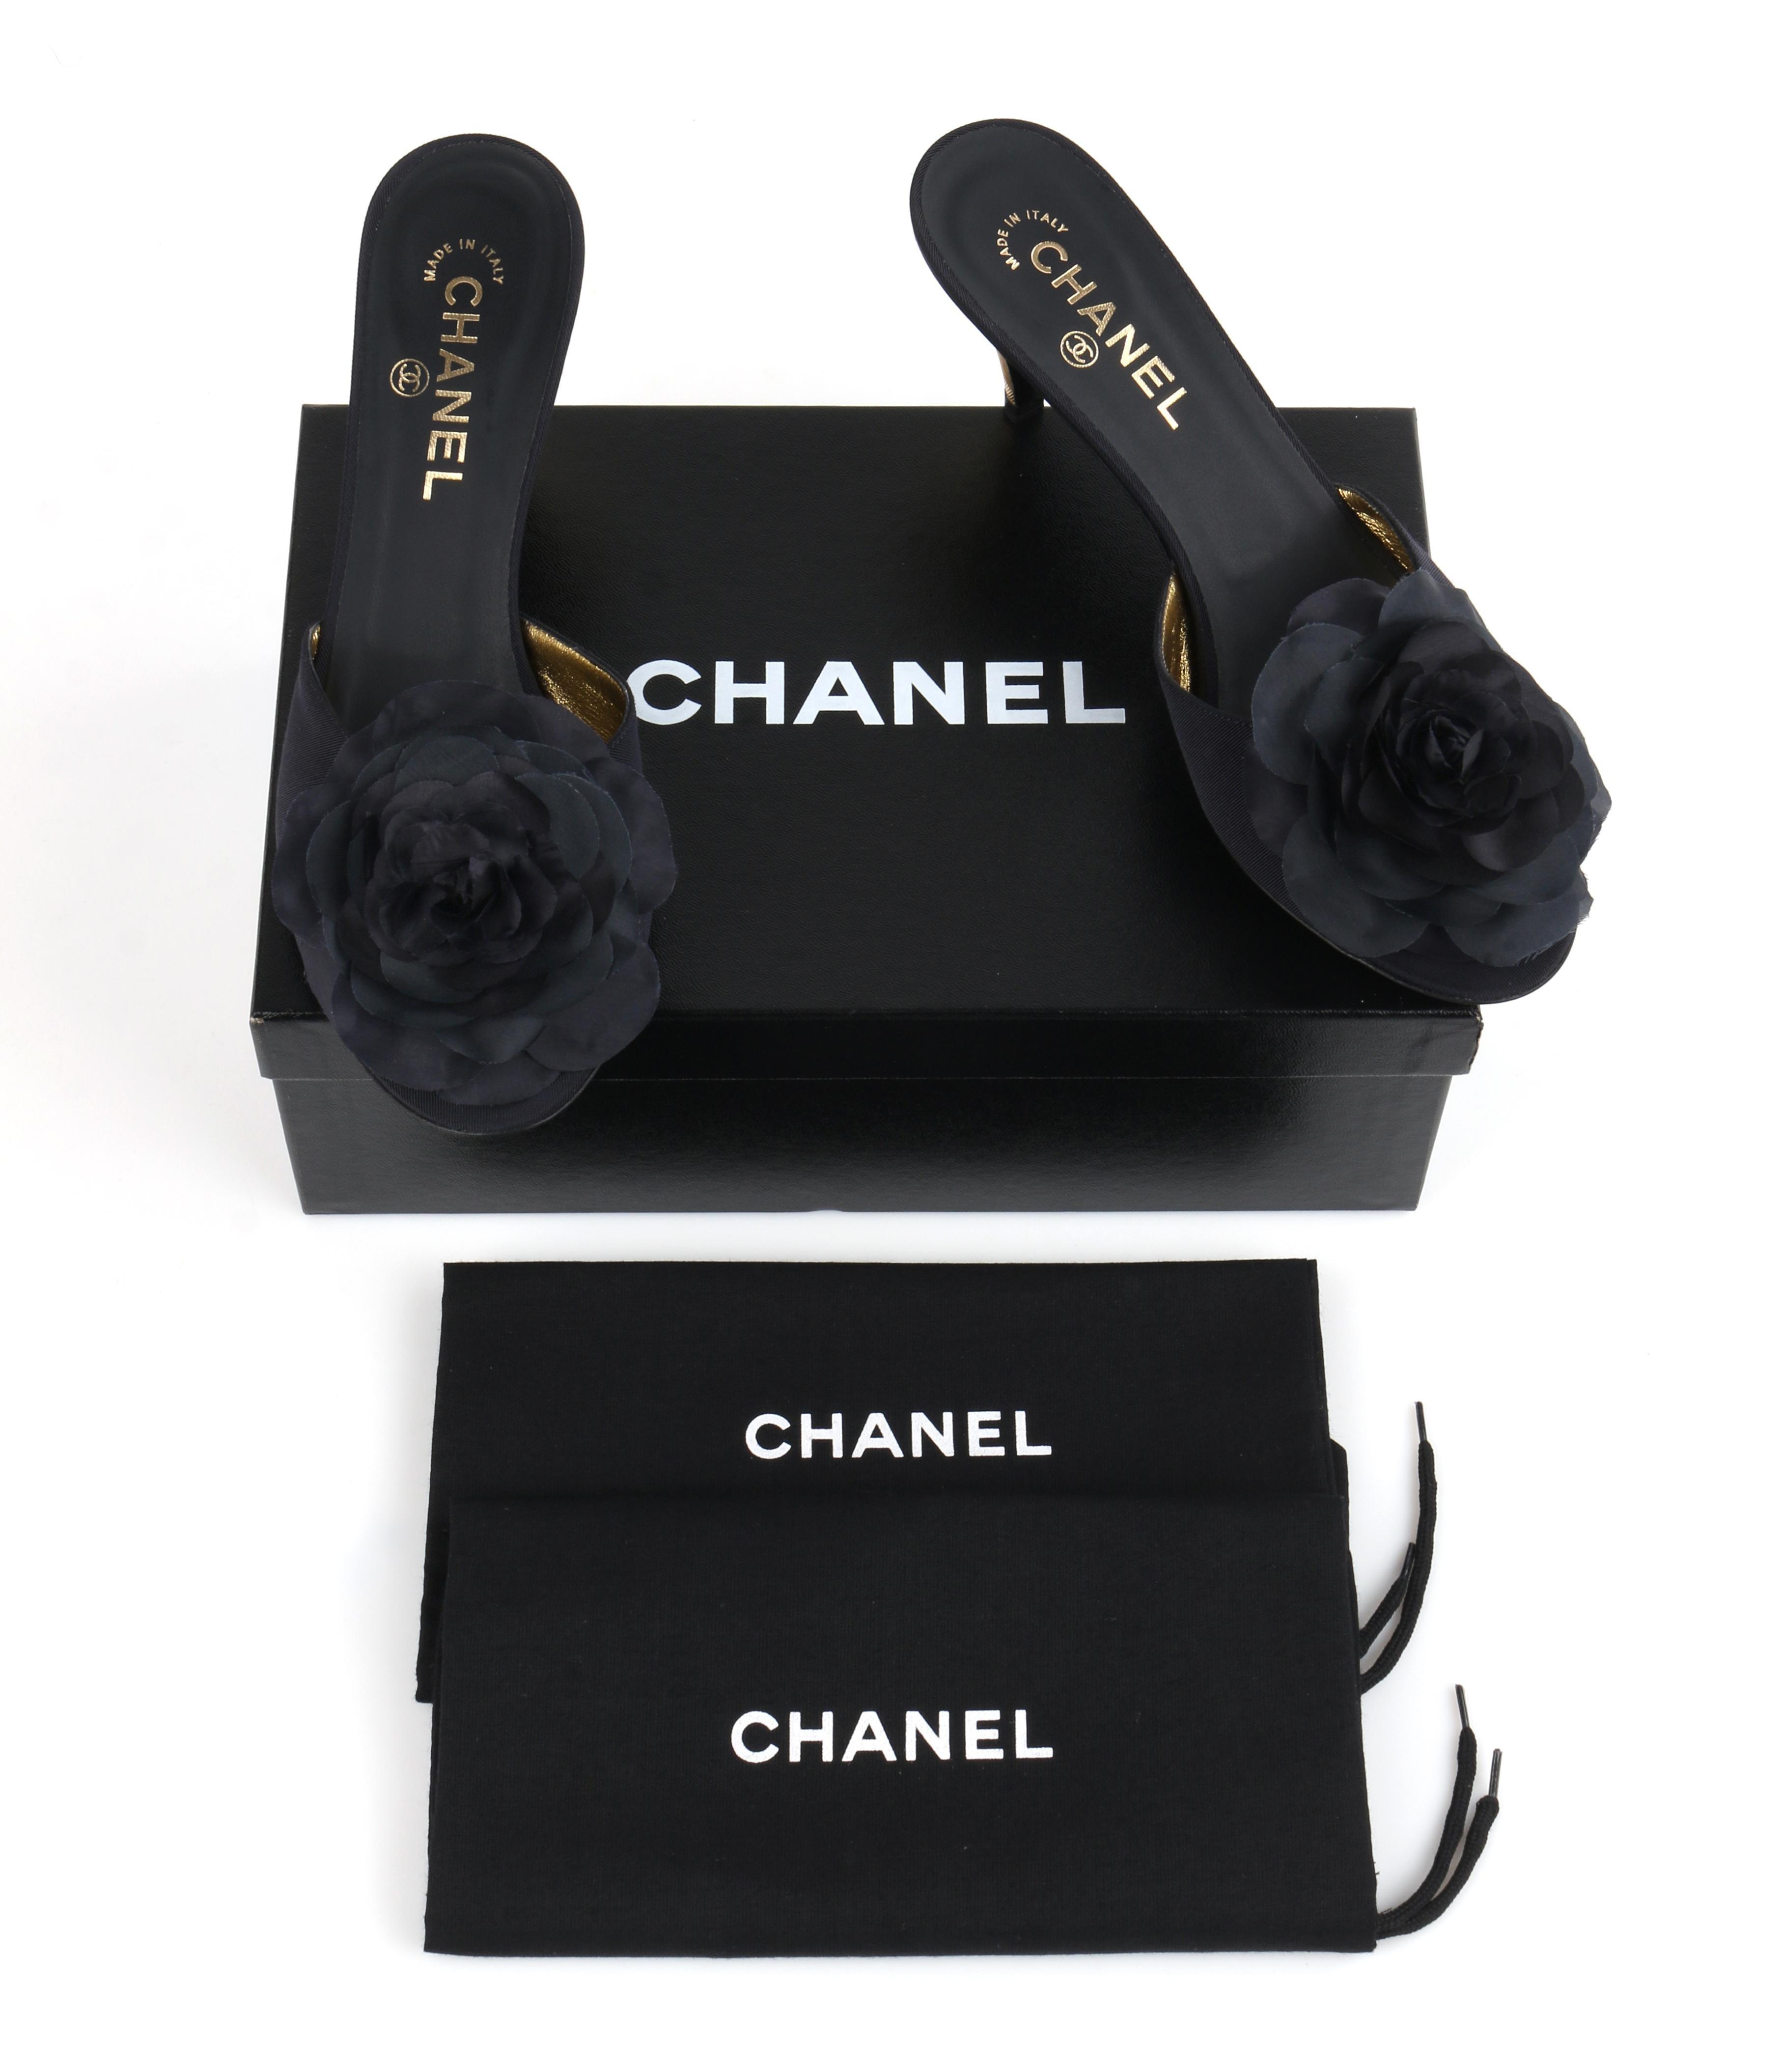 8ad75148bd CHANEL Navy Blue Grosgrain Camellia Gold Kitten Heels Mules Slides NIB For  Sale at 1stdibs